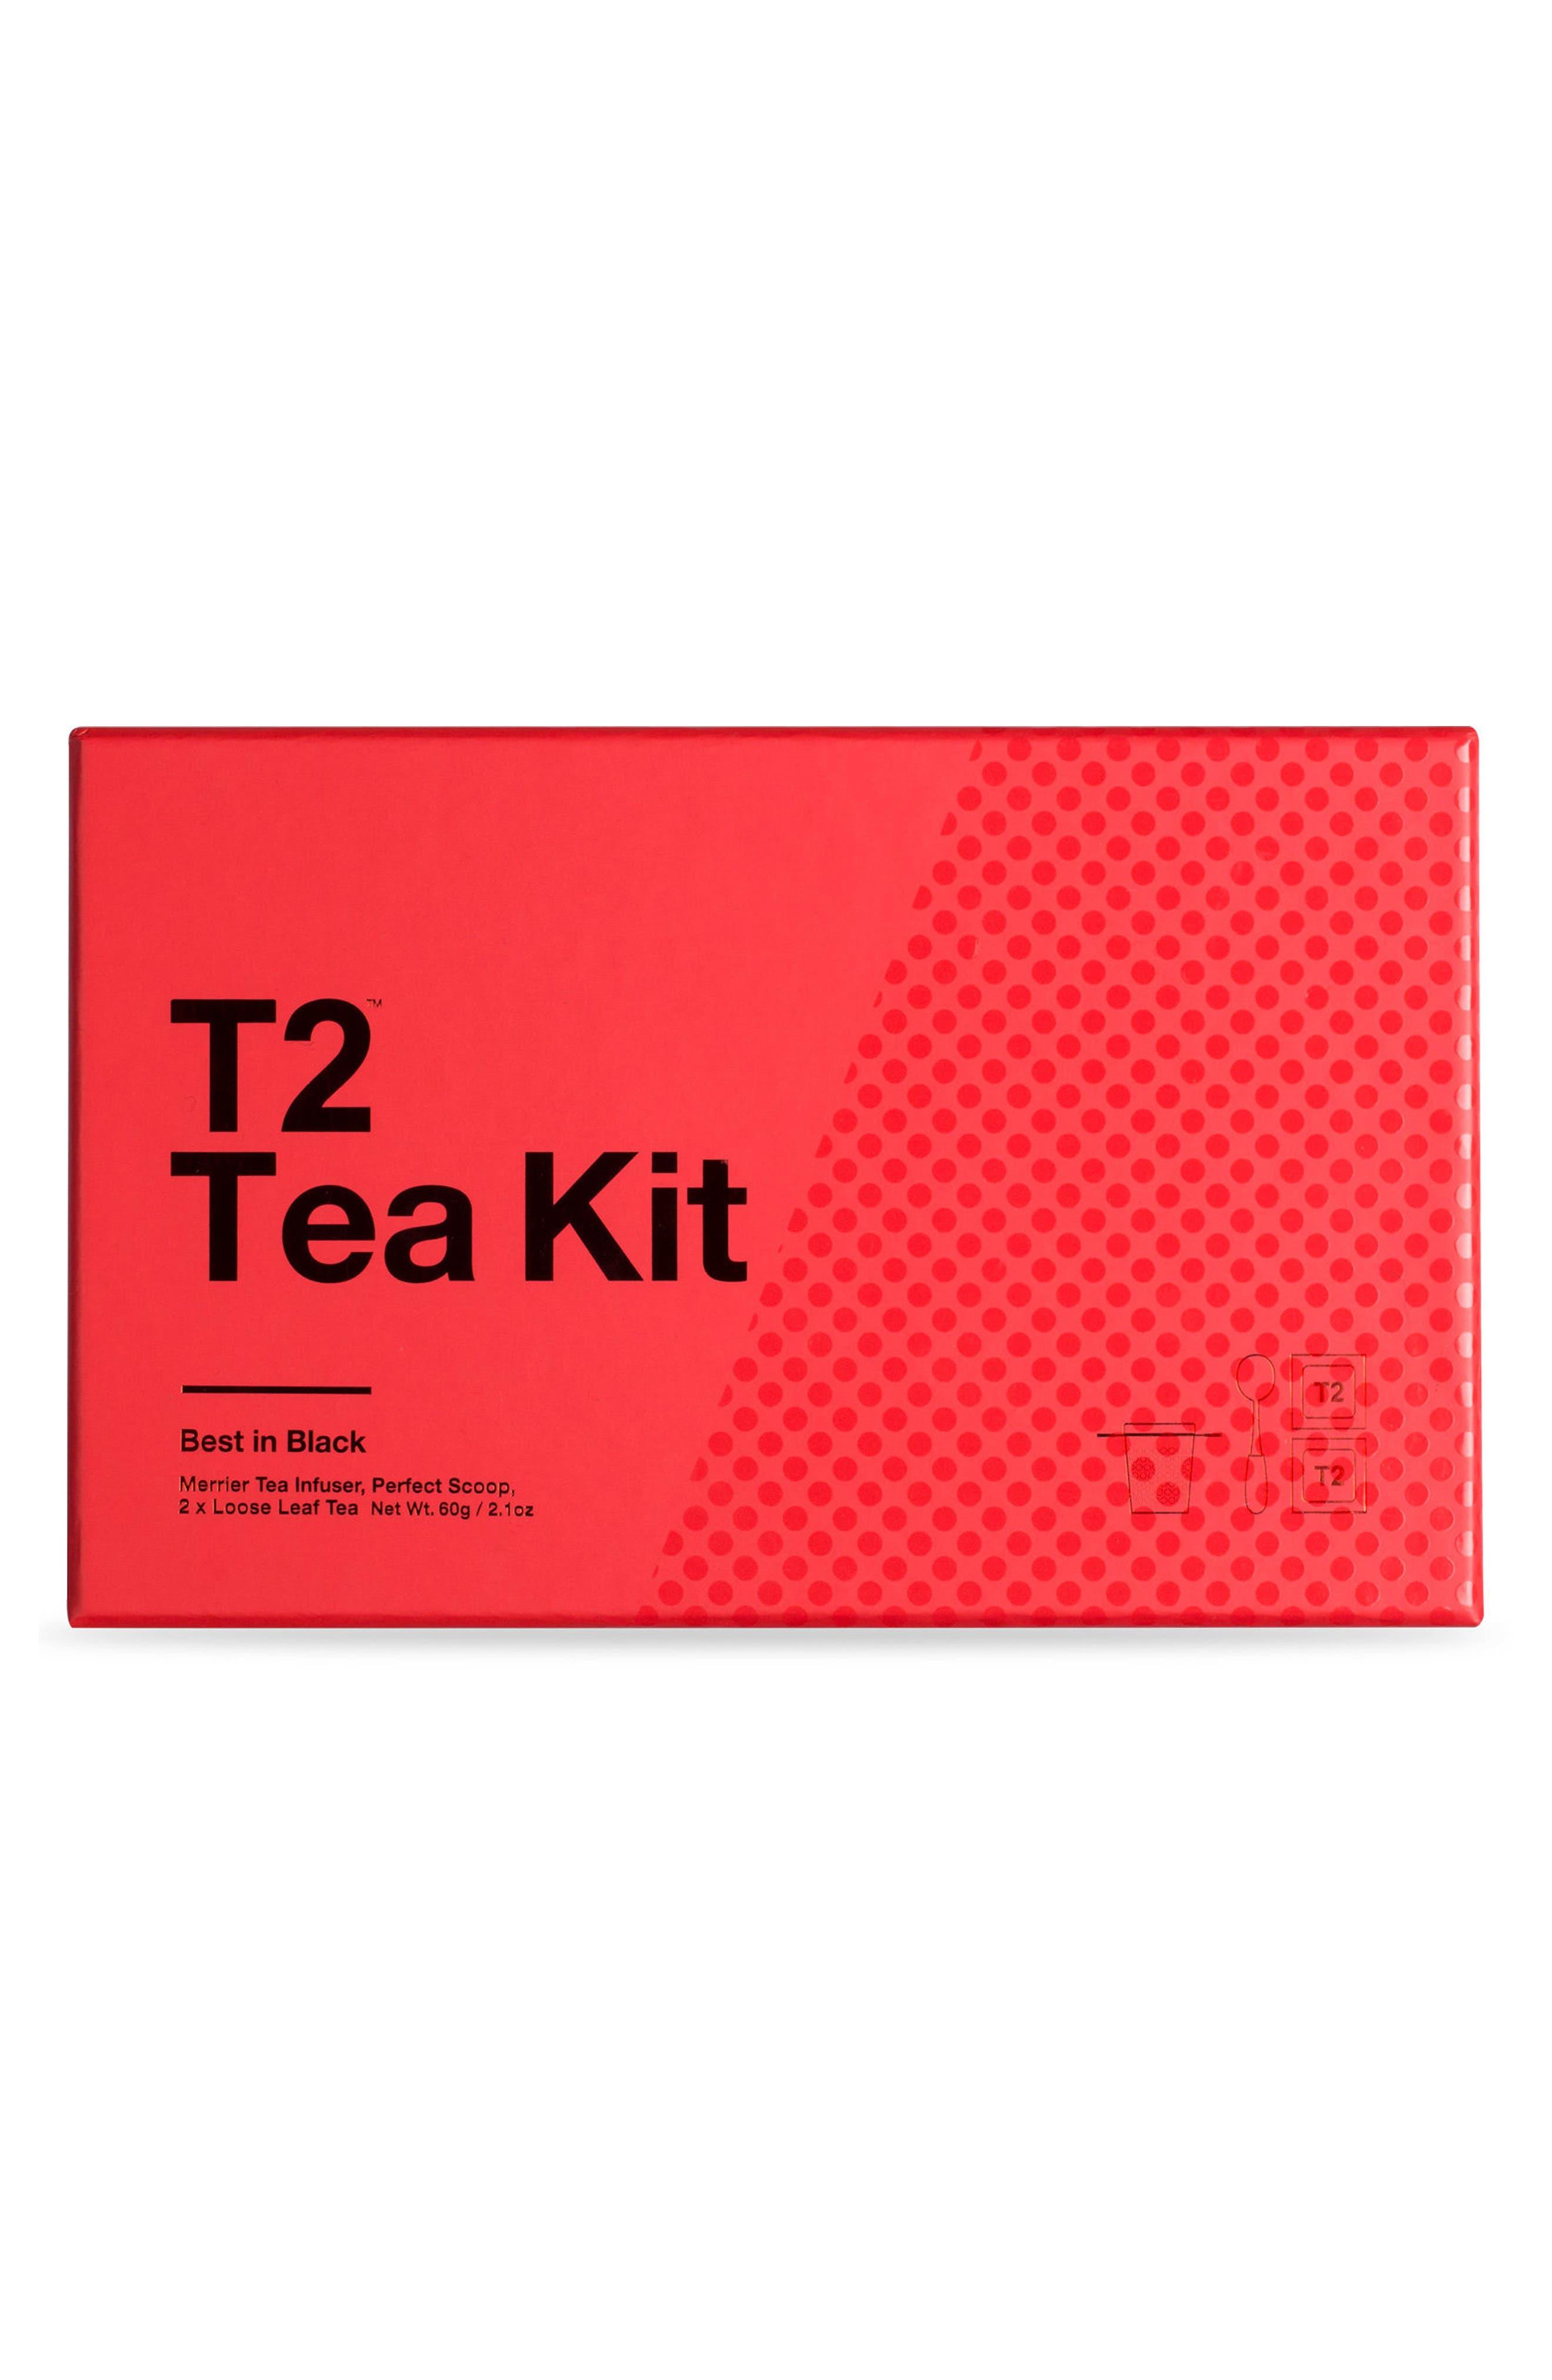 Best in Black Loose Leaf Tea Box Set,                         Main,                         color, Multi